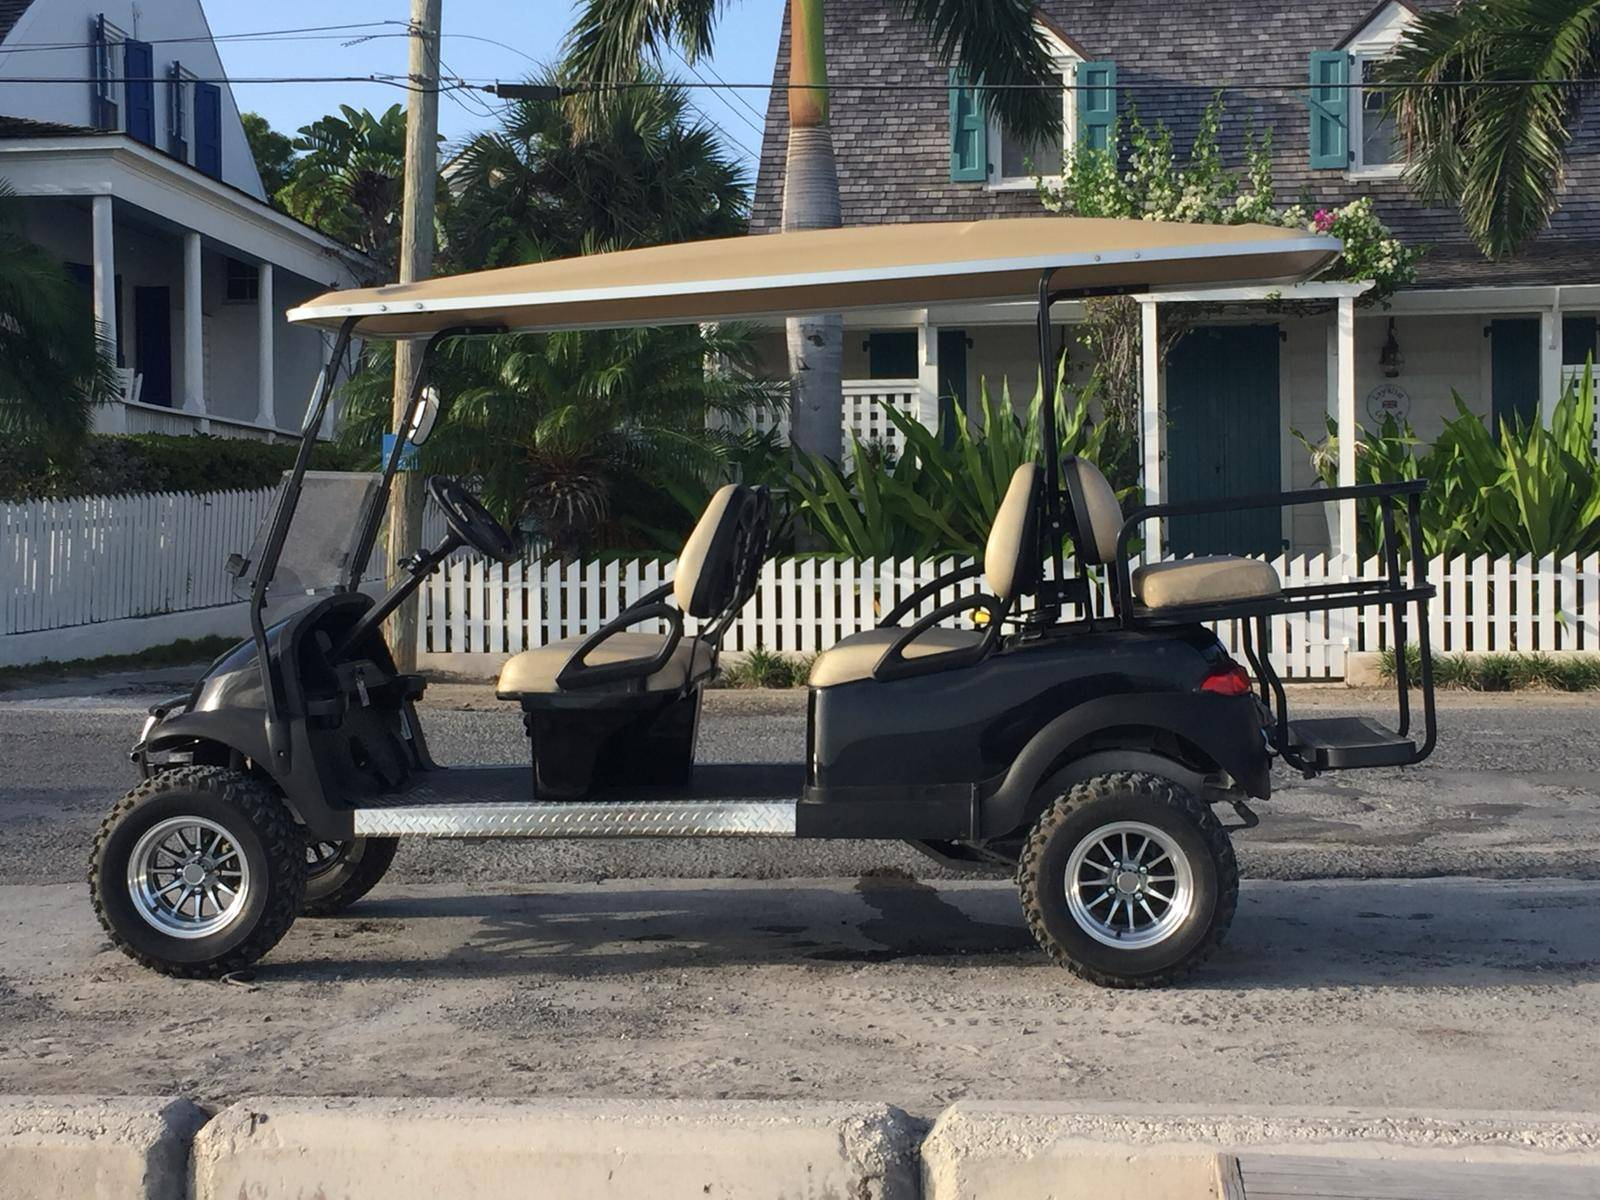 Premium Harbour Island 6-Seat Golf Cart Rental